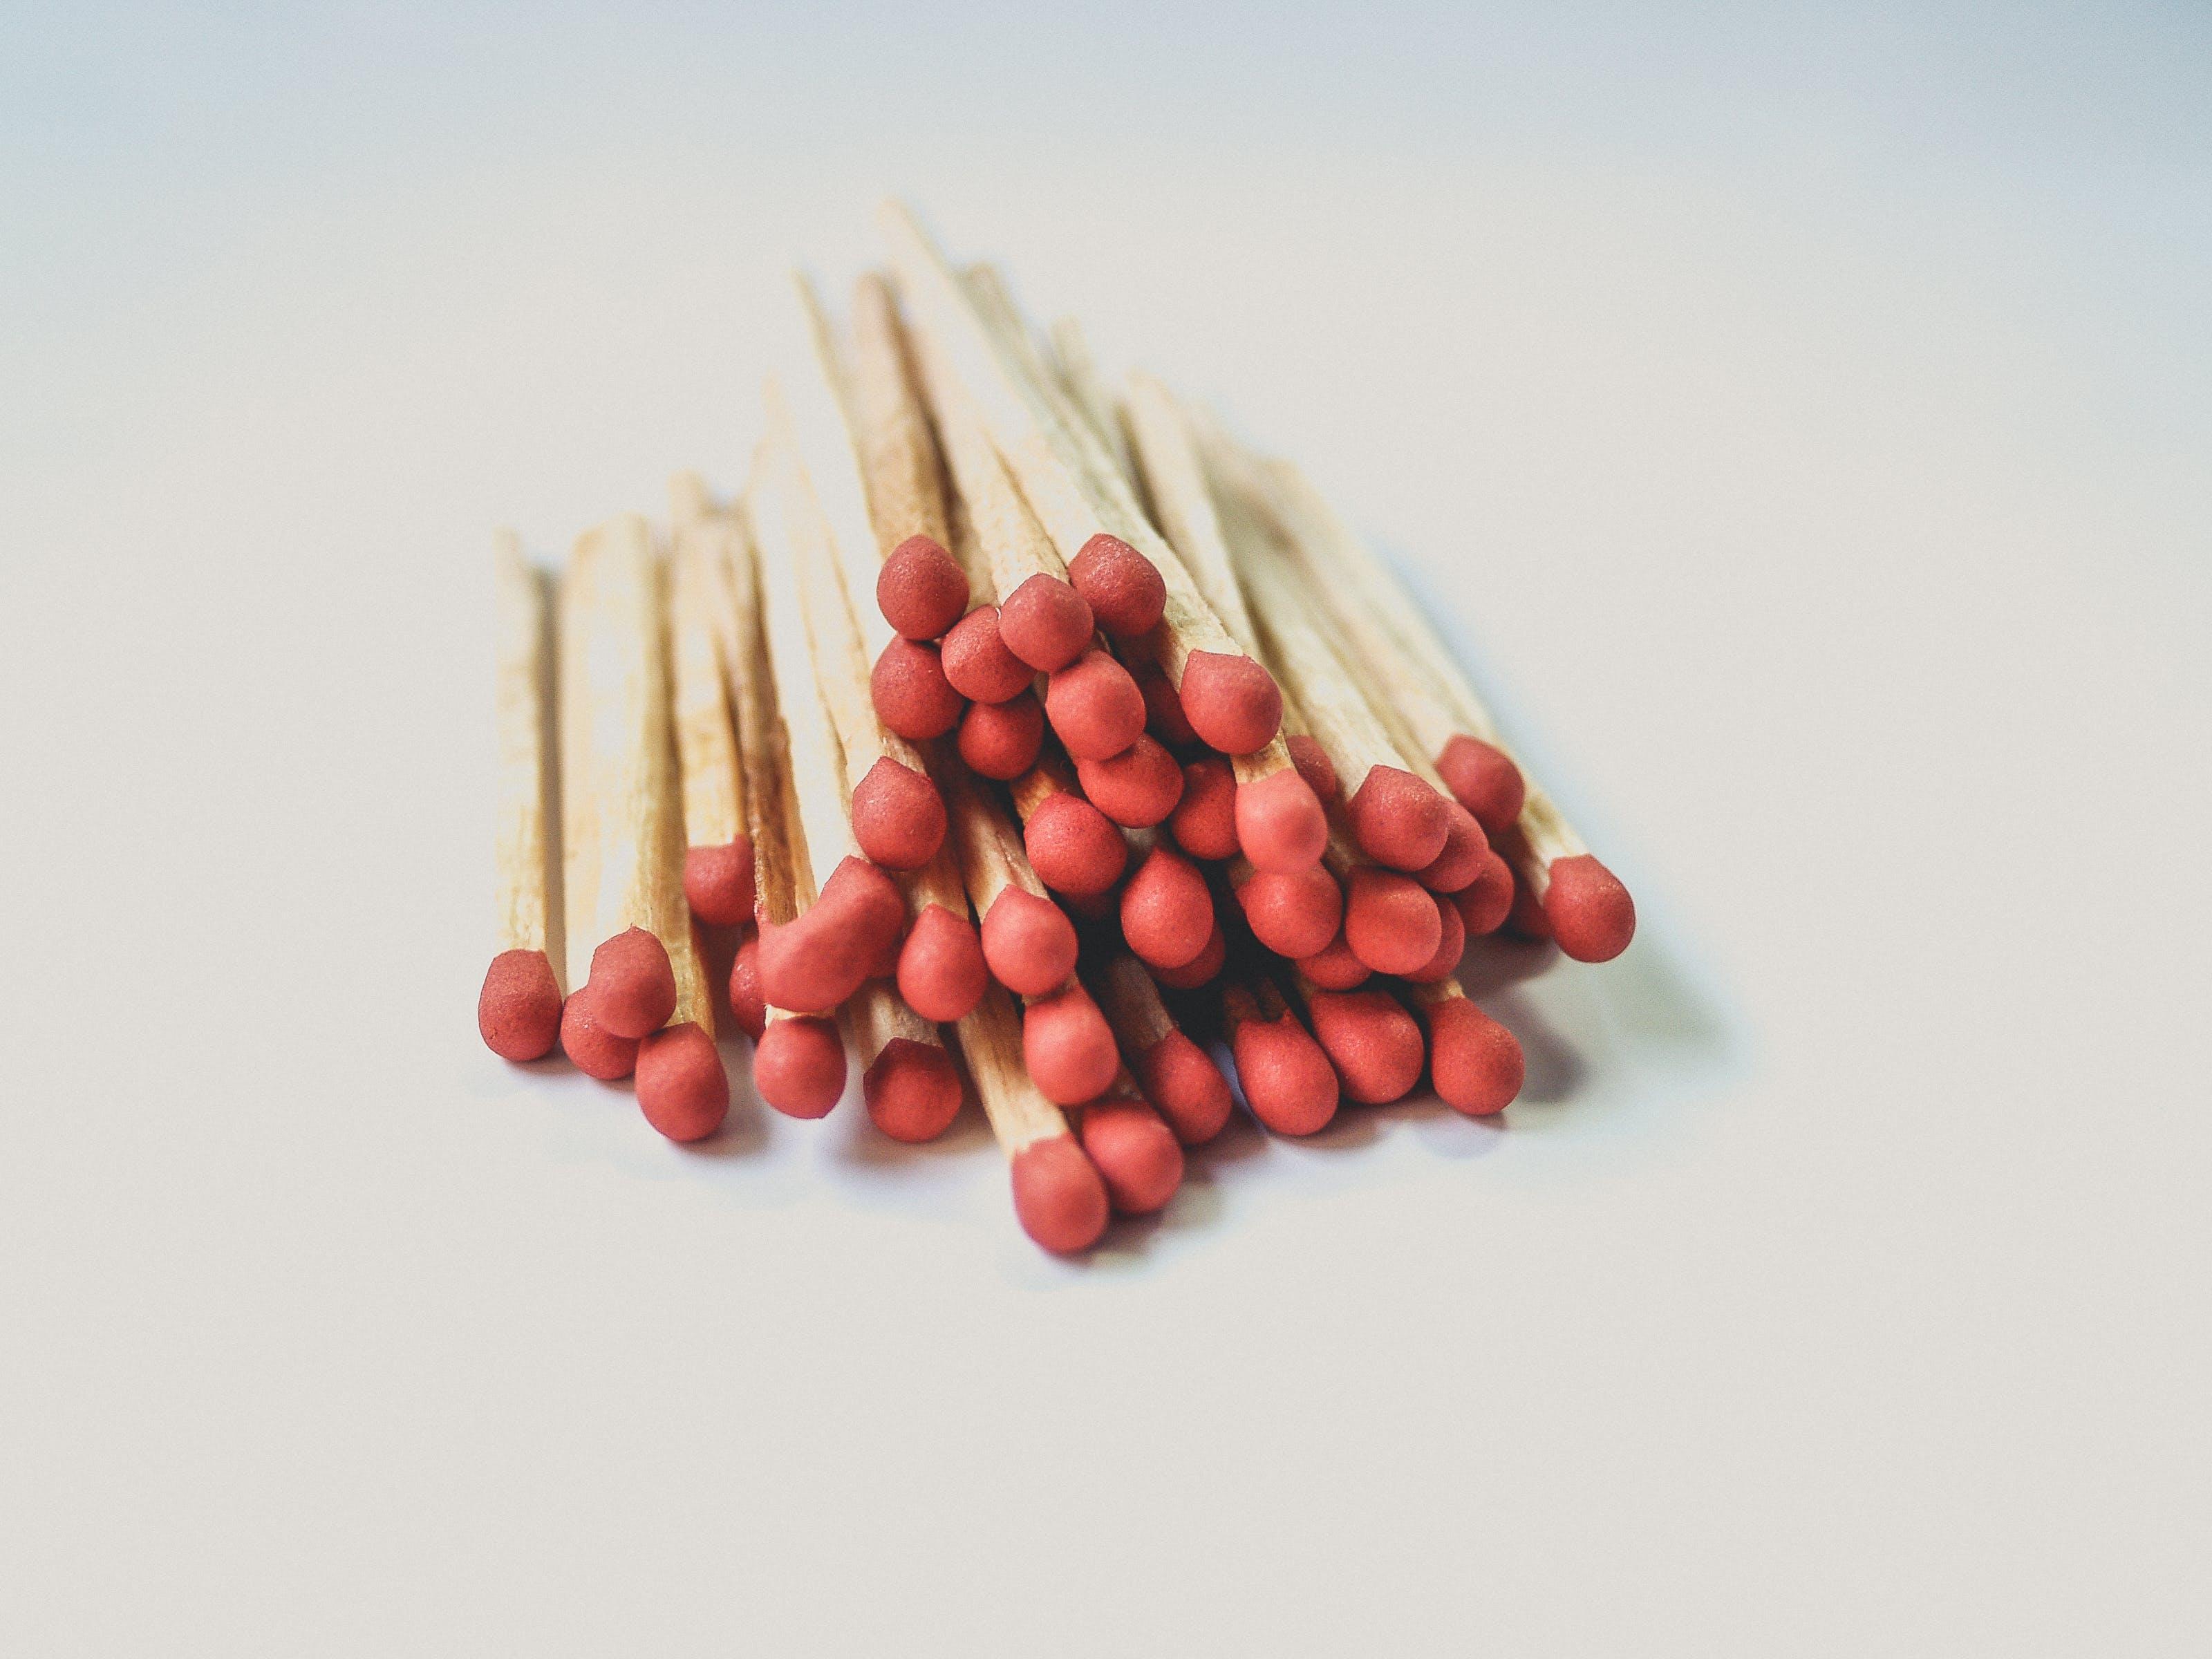 Close-Up Photography of Matchsticks